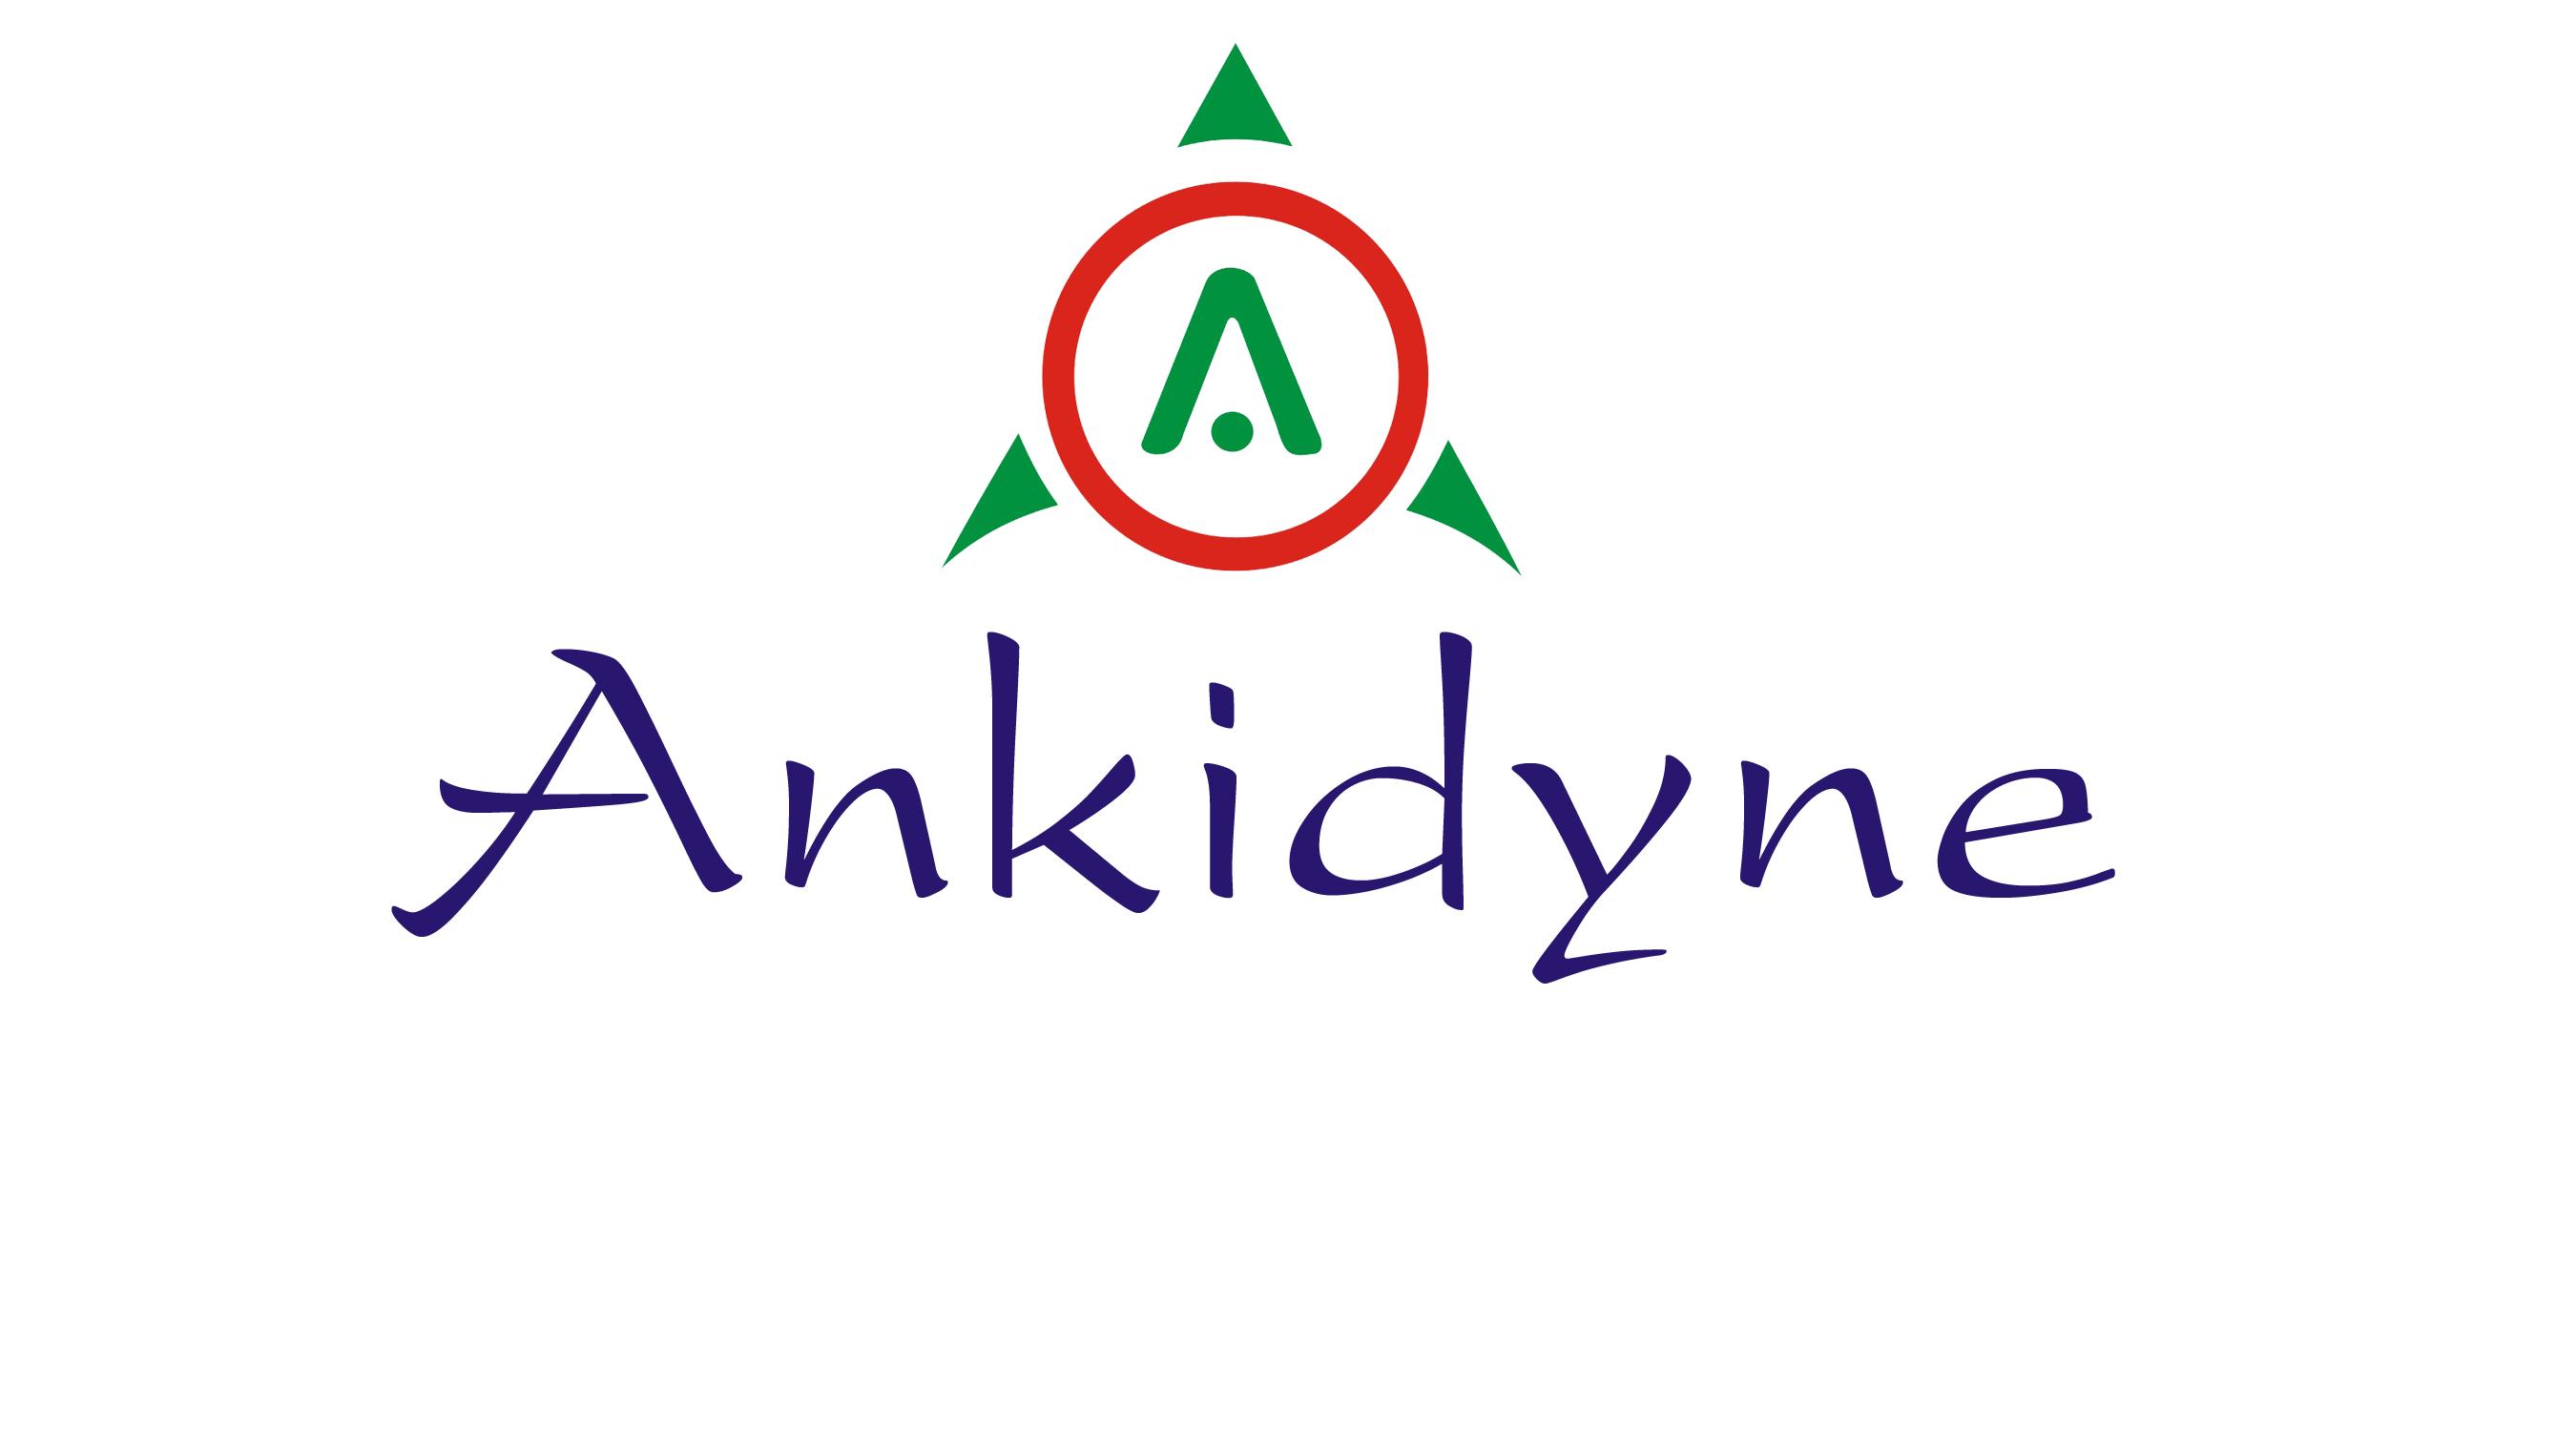 Ankidyne Job Openings